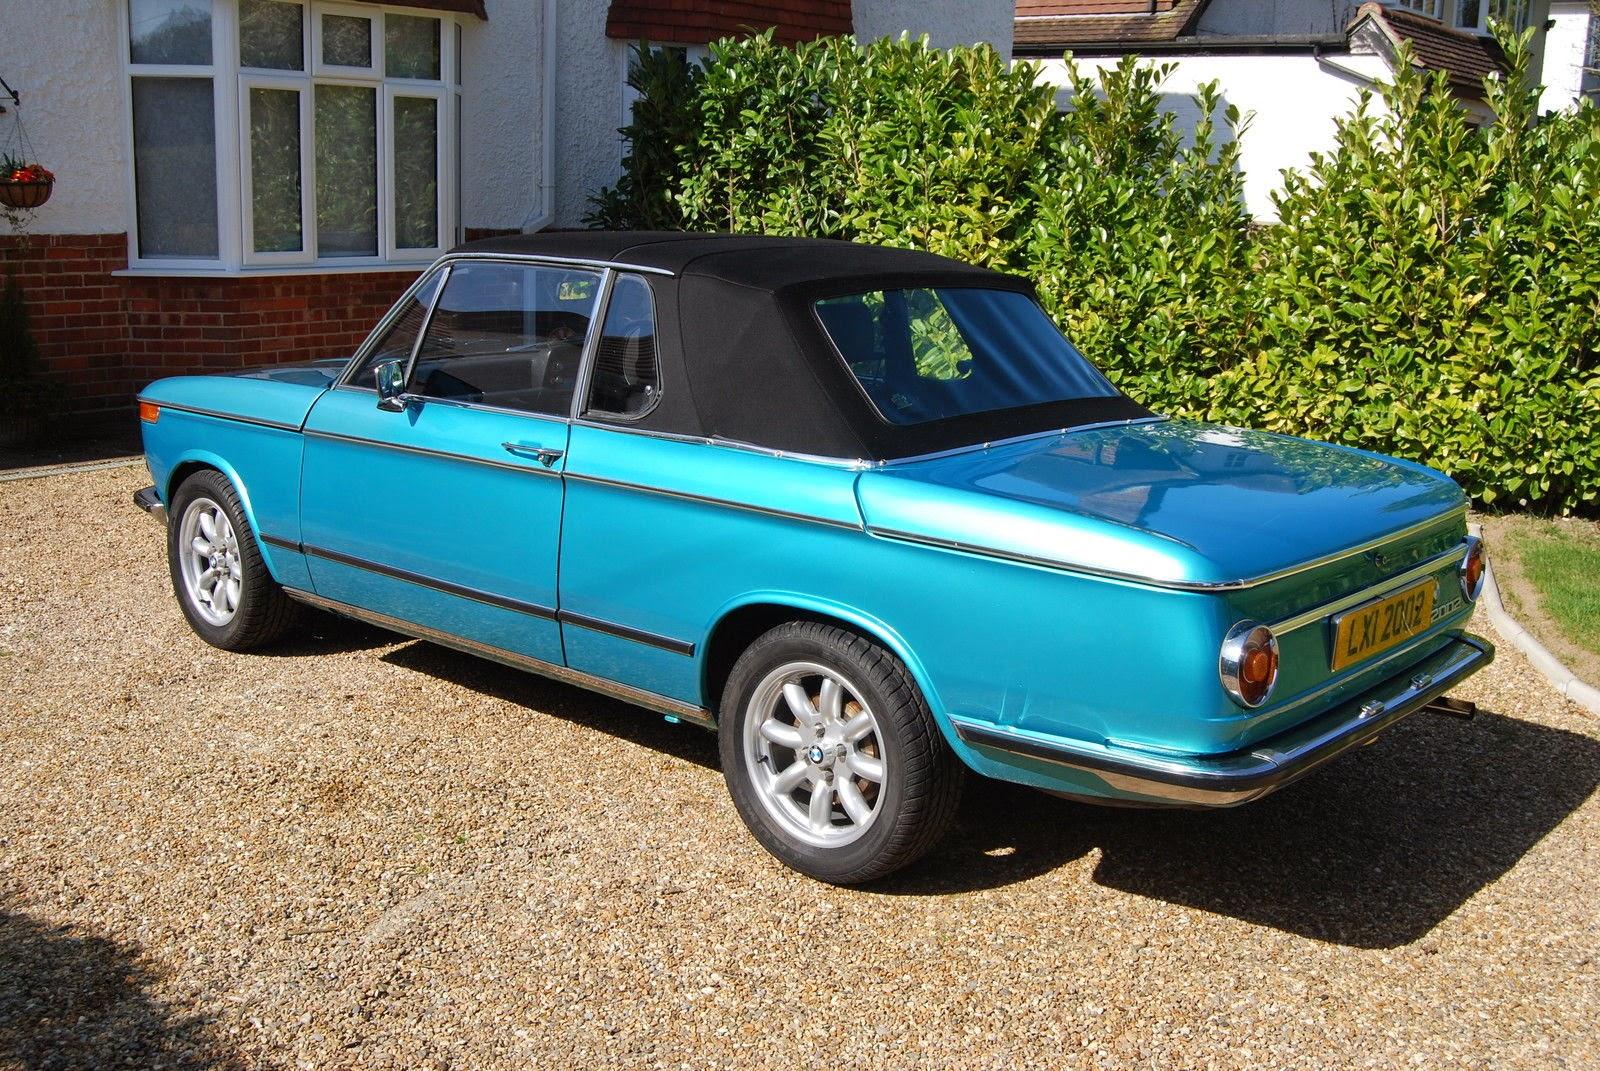 Baurspotting: 1973 BMW 2002 BAUR CABRIO Targa on UK eBay!